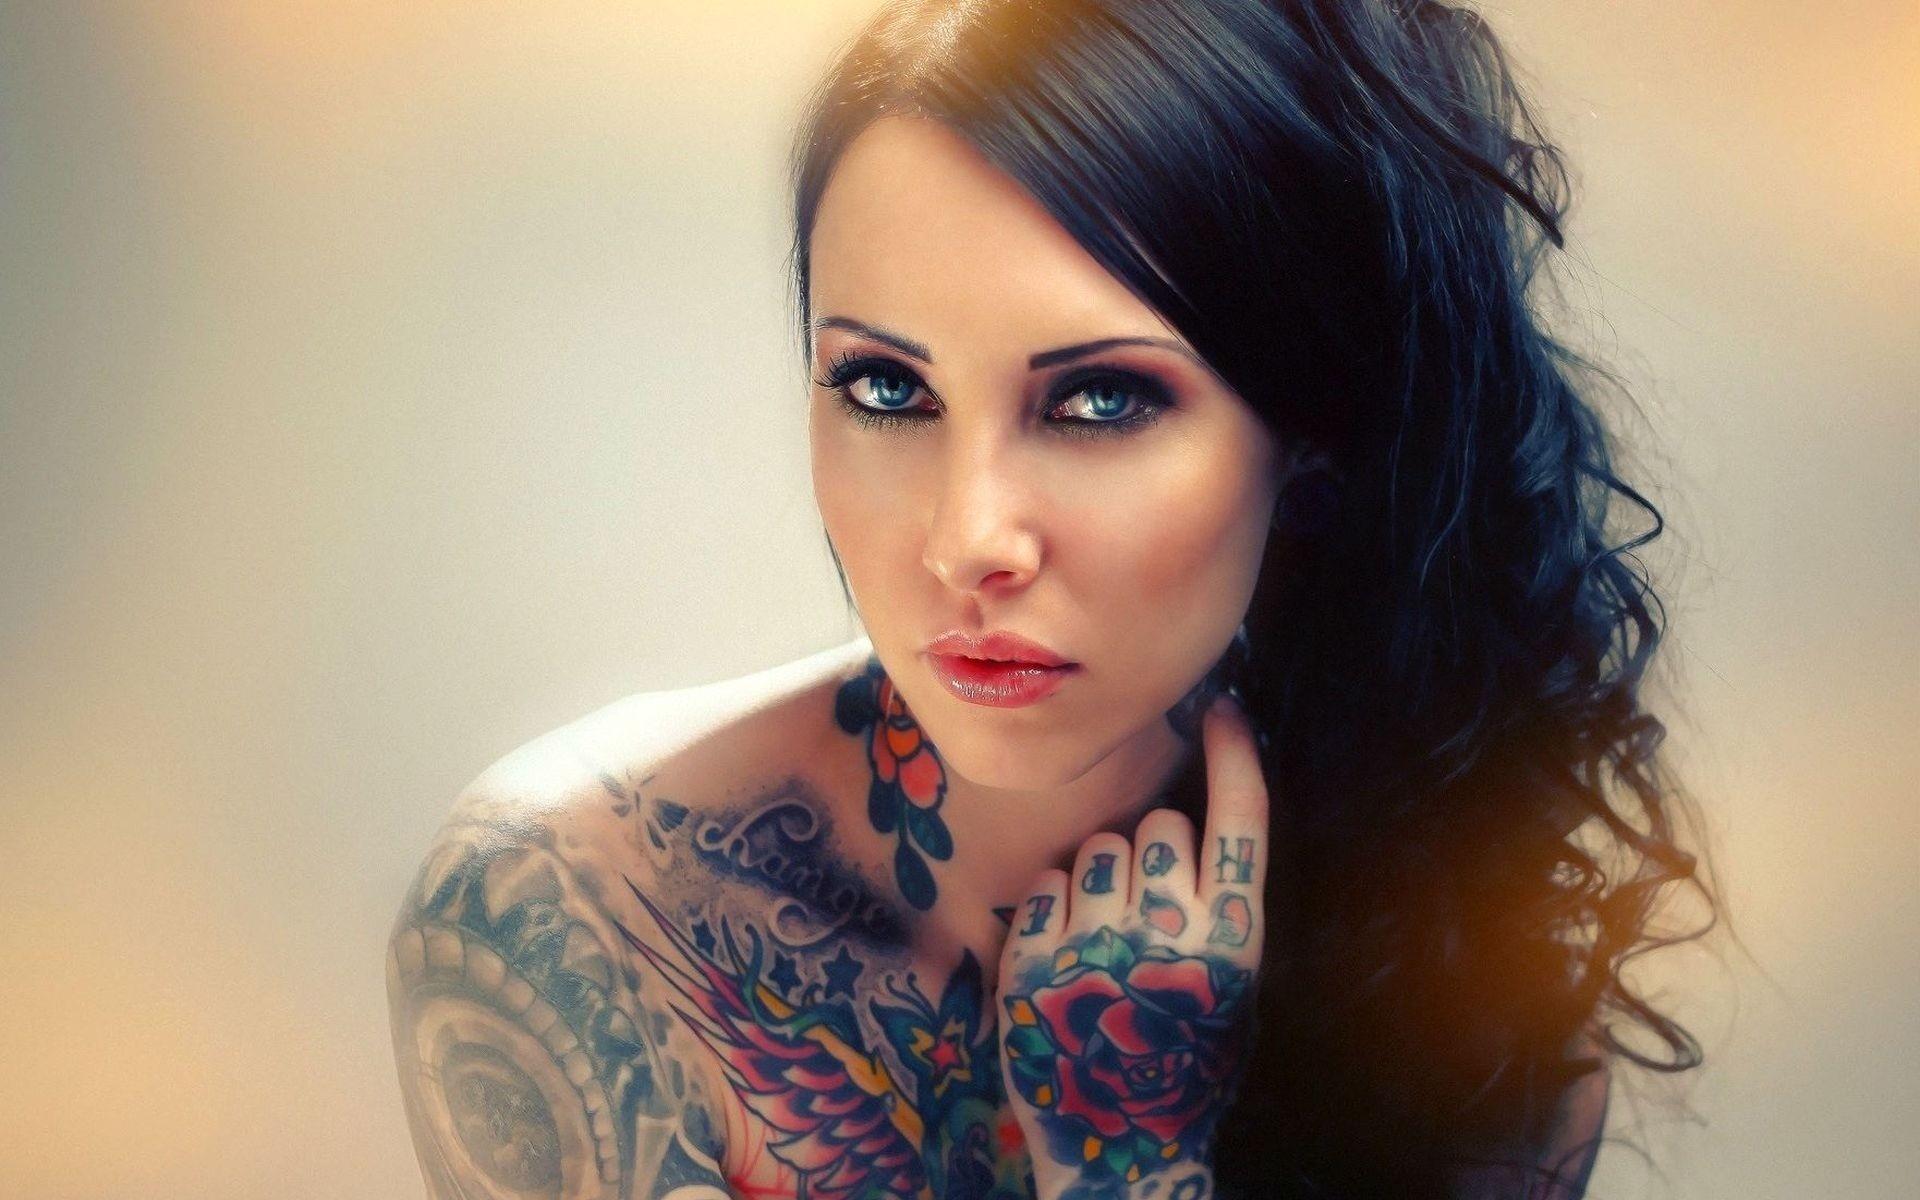 Appealing Tattoos for Women 60